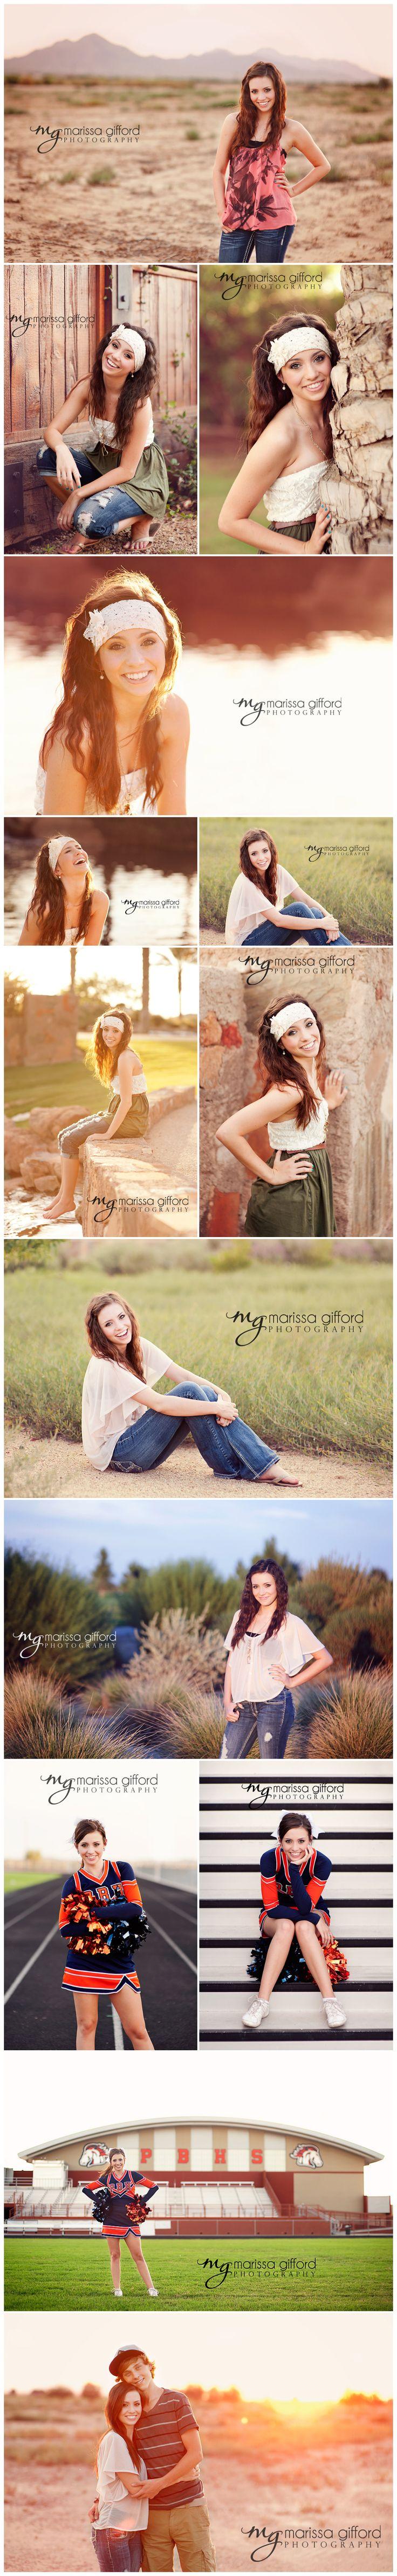 Senior Girl Photography - Marissa Gifford Photography